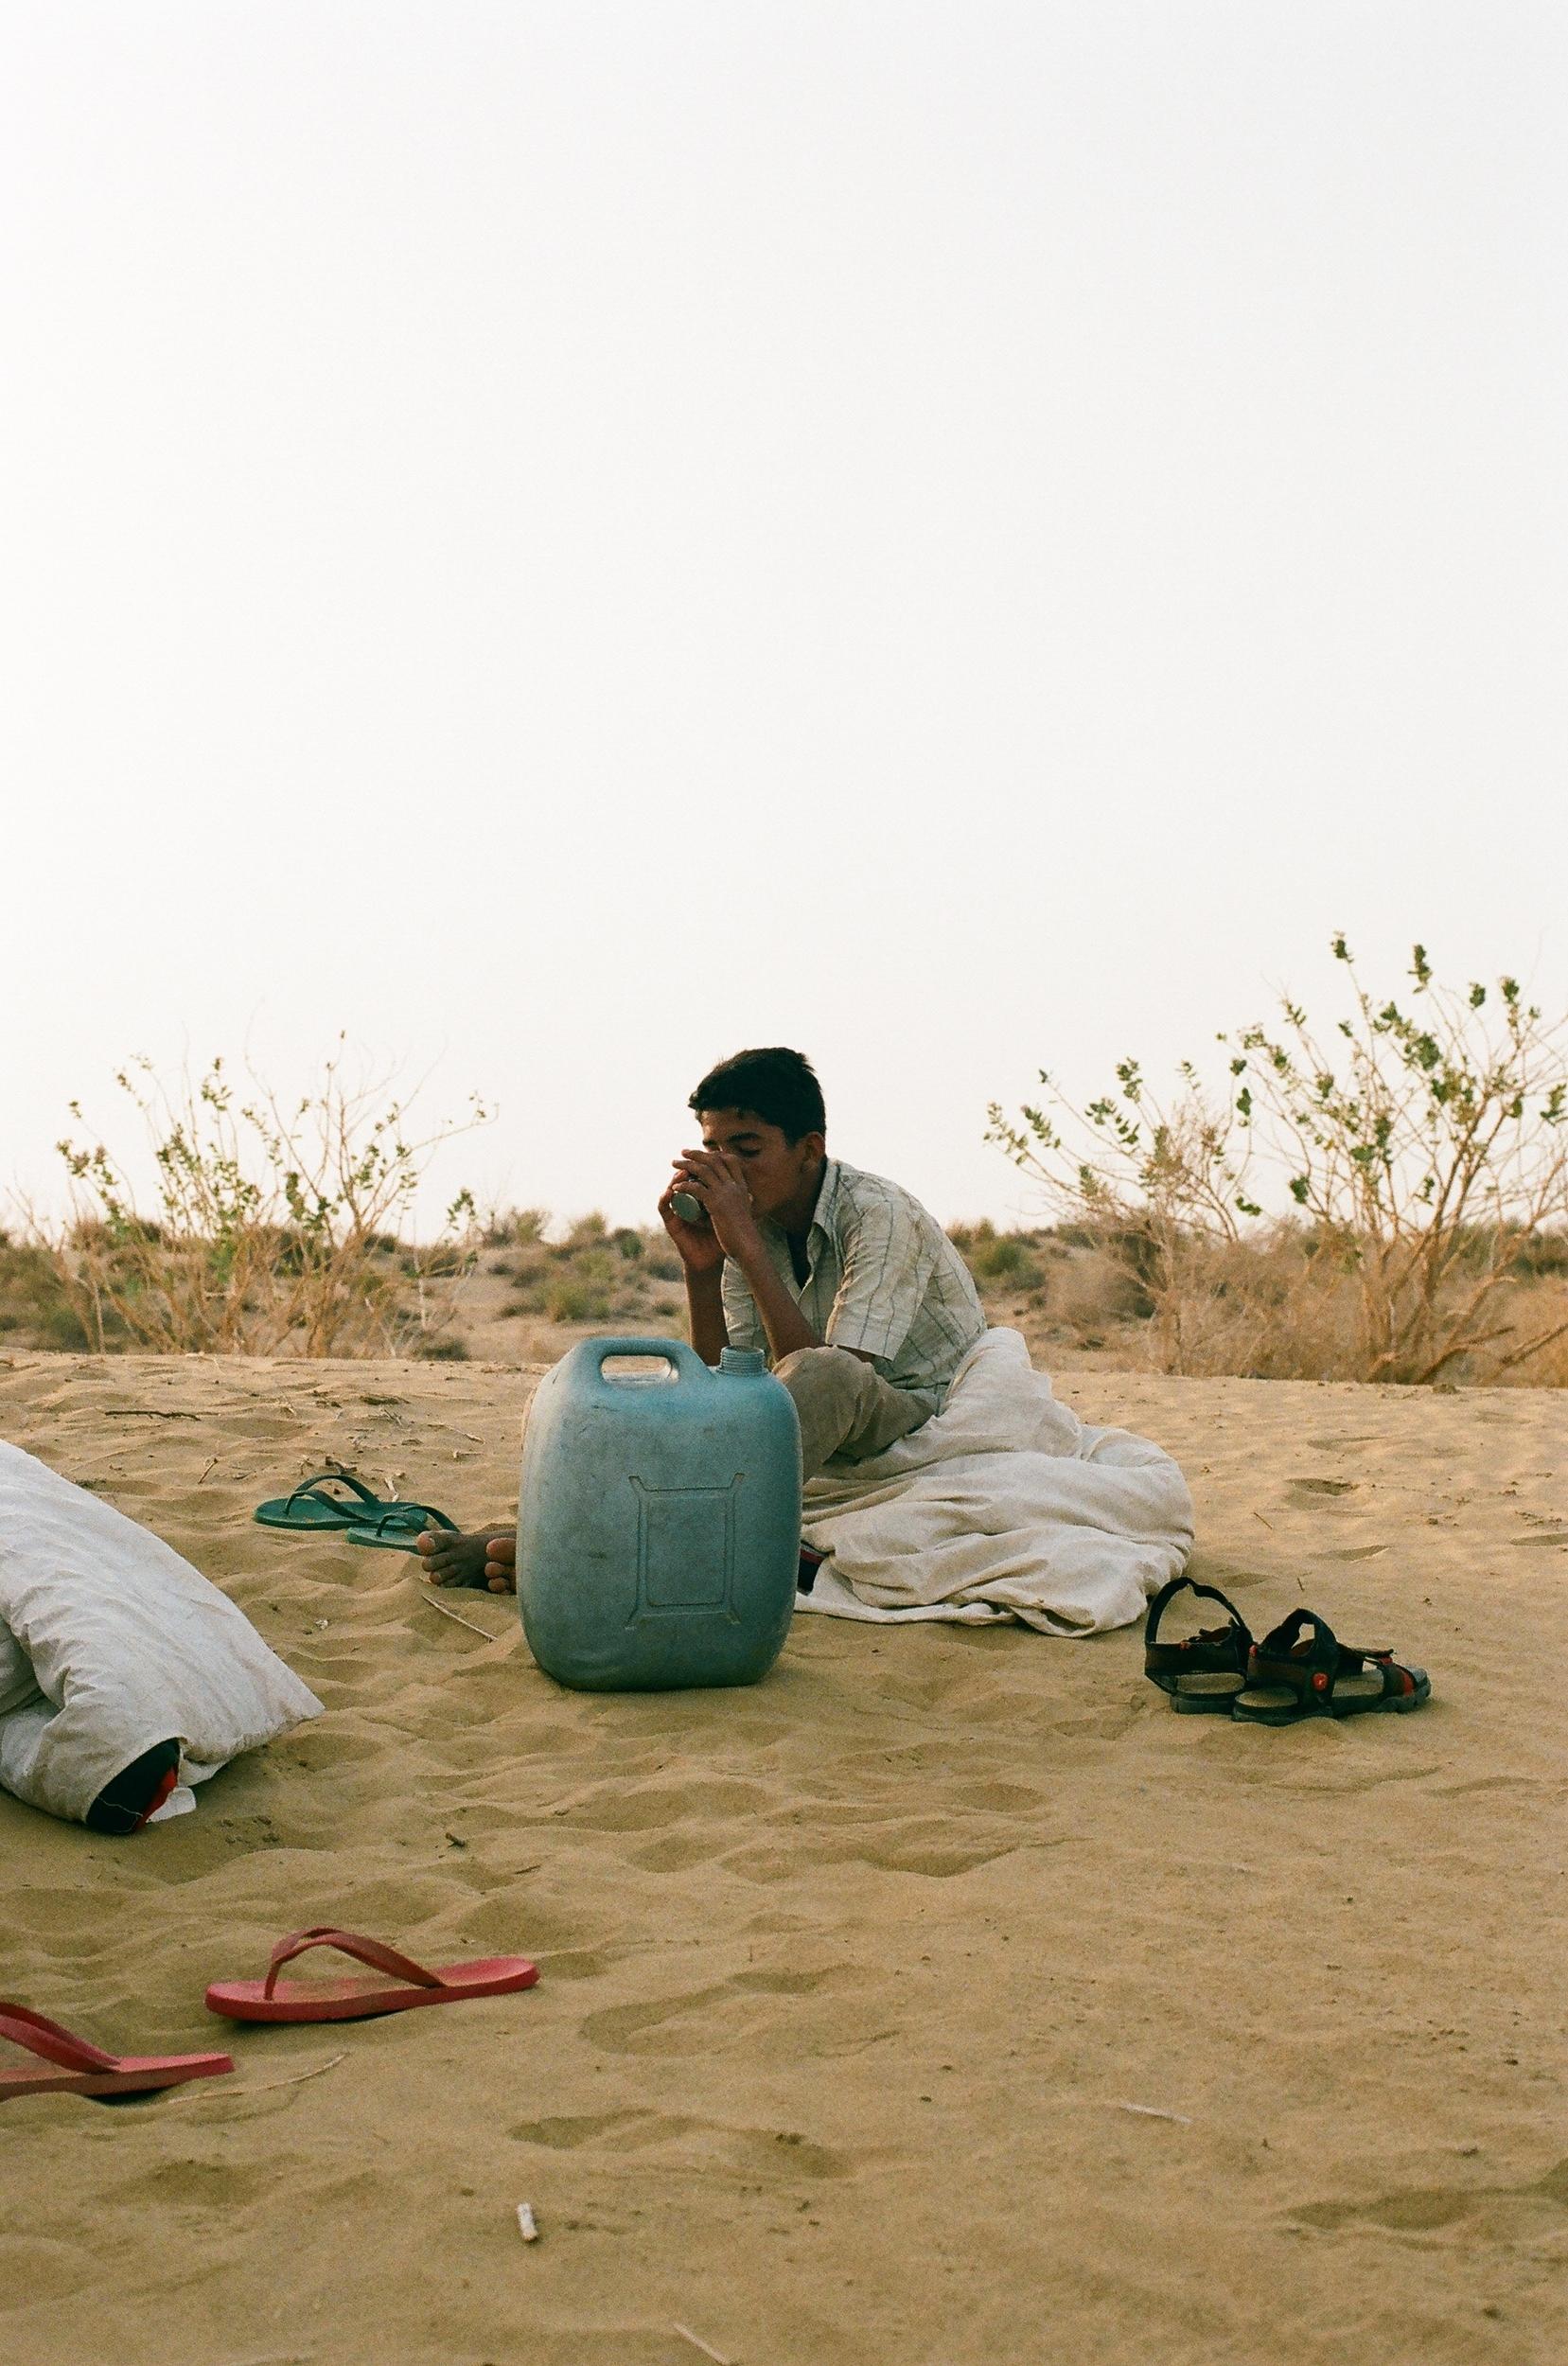 Sandy Desert of Rajasthan, India